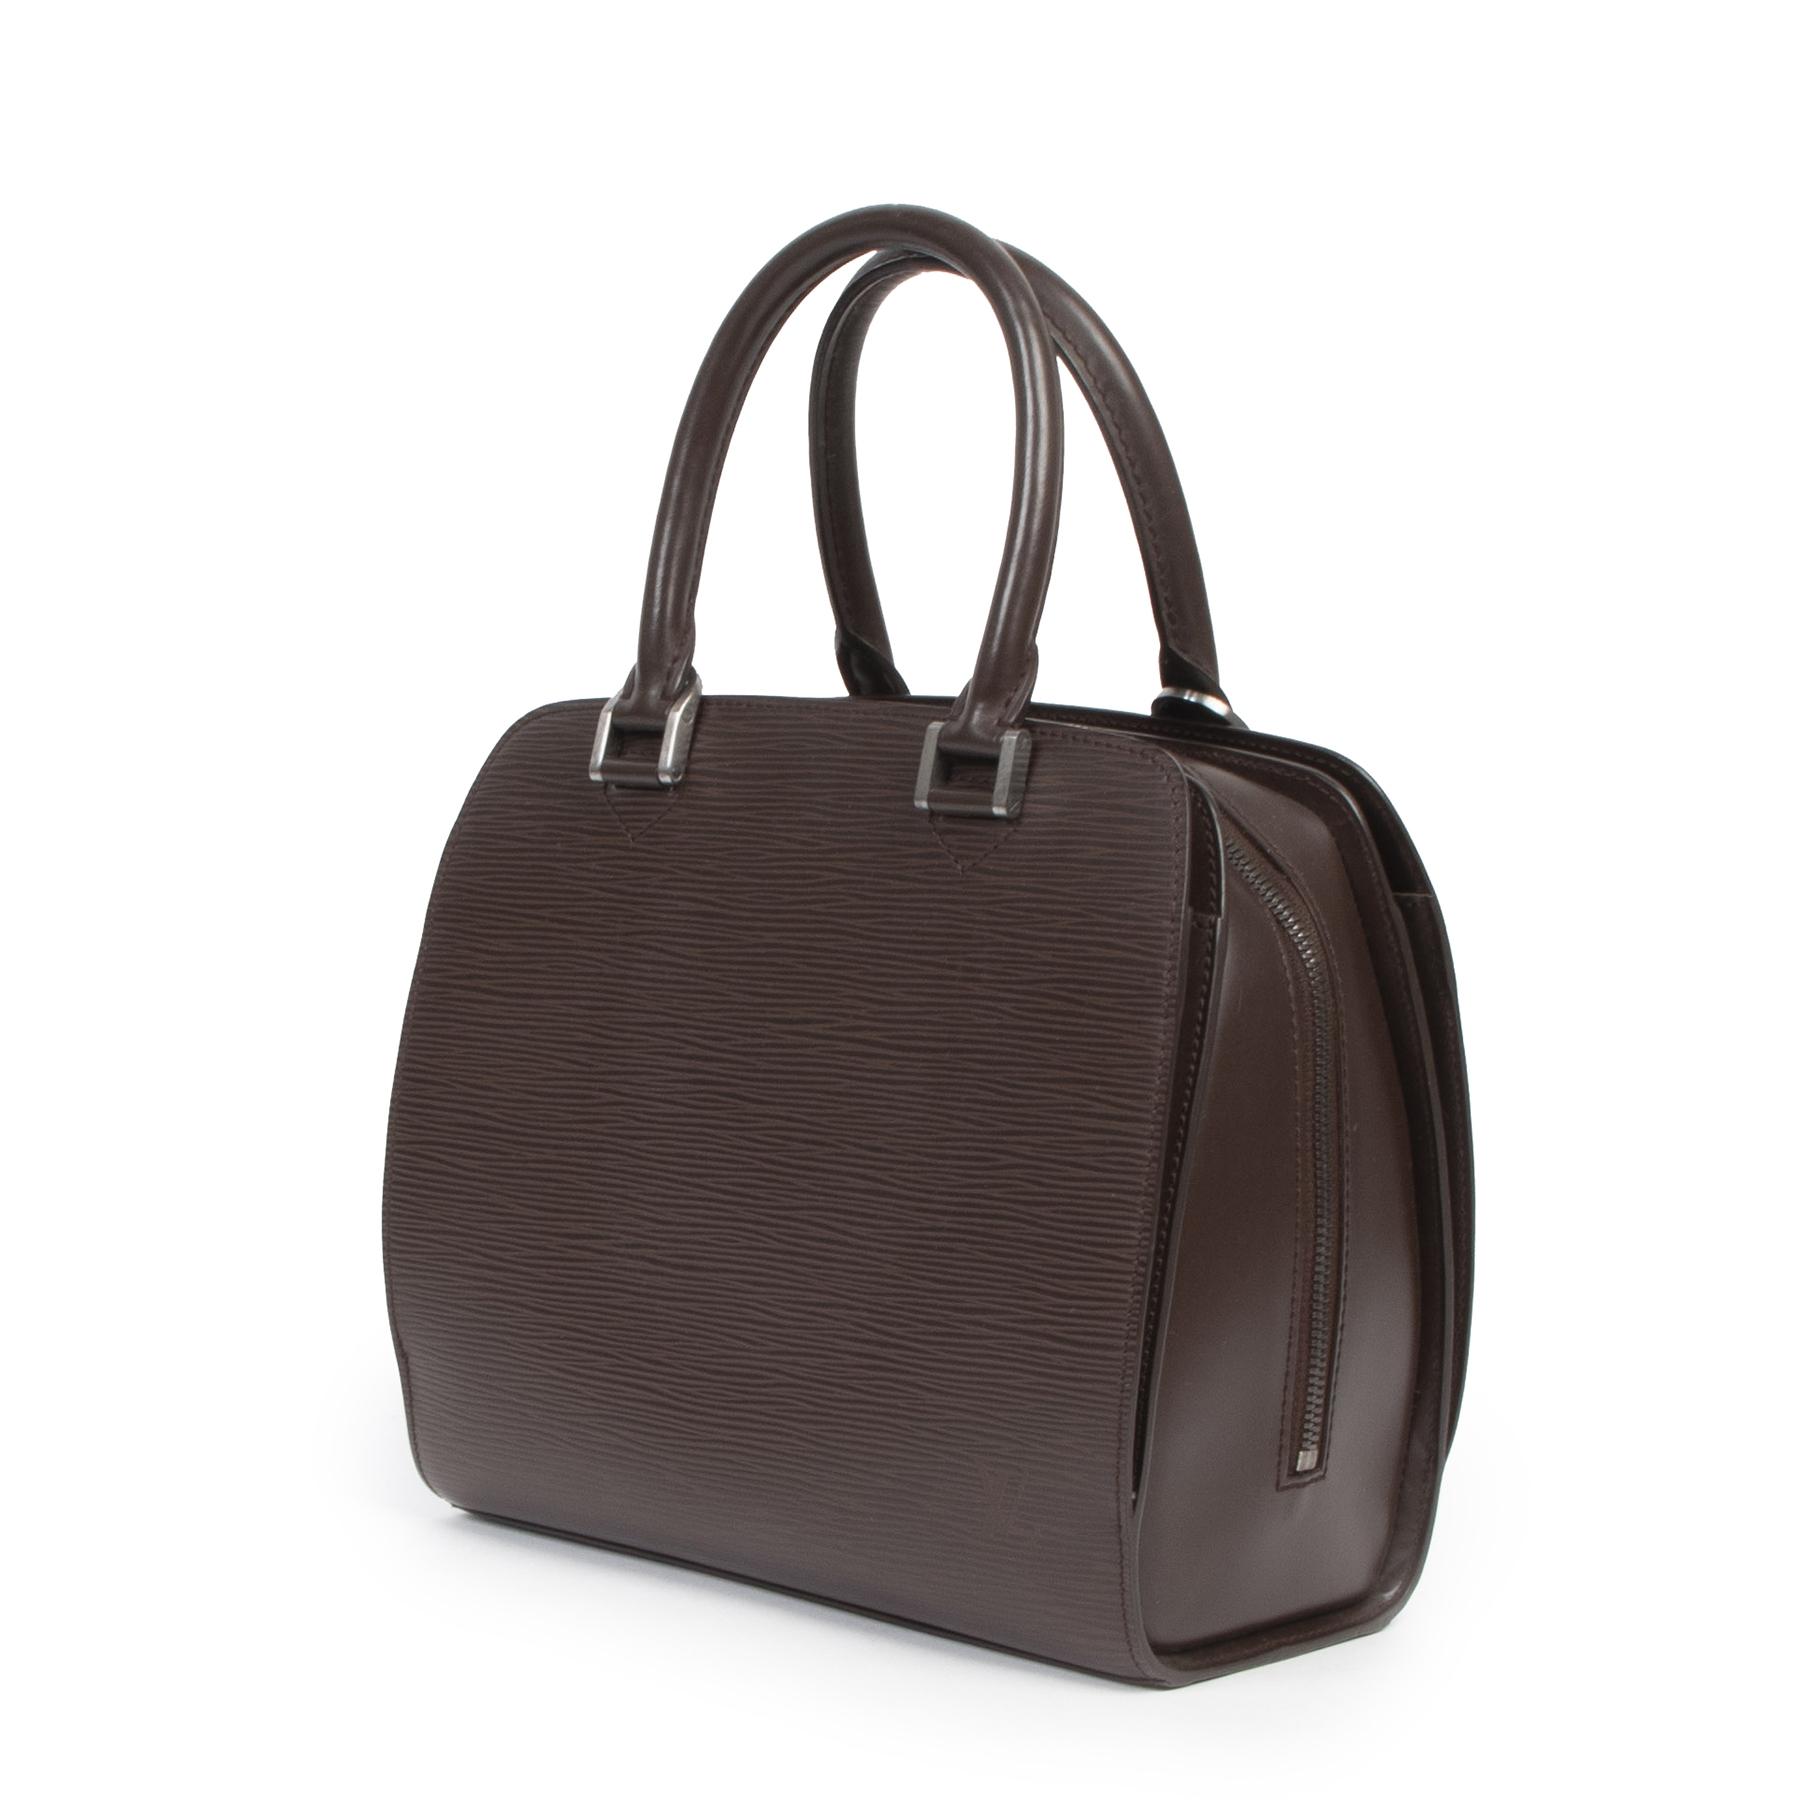 Authentic secondhand Louis Vuitton Brown Pont Neuf Epi Leather Bag designer bags fashion luxury vintage webshop safe secure online shopping